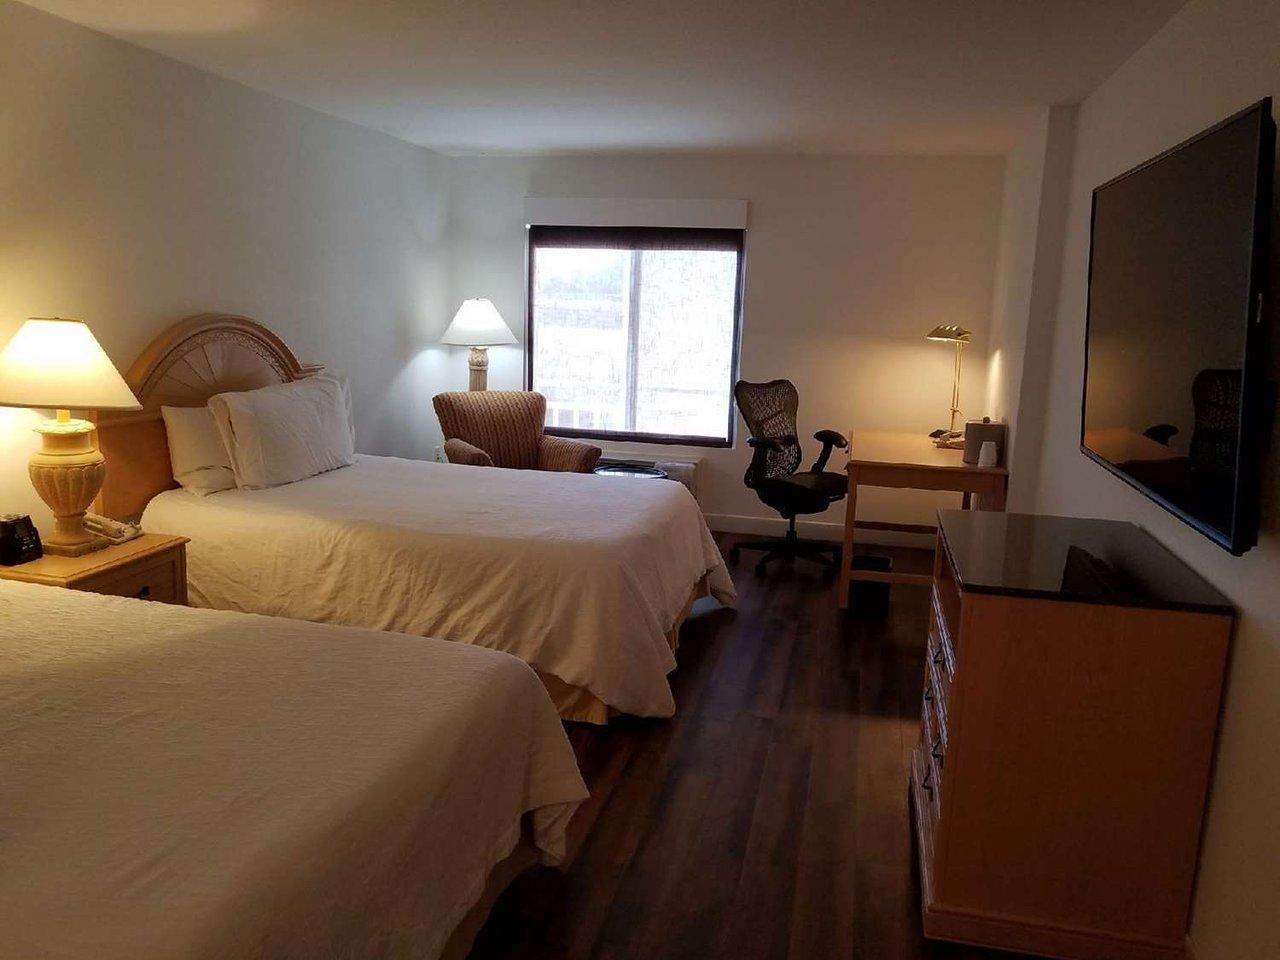 Hilton Garden Inn Mountain View - UPDATED 2018 Hotel Reviews & Price ...